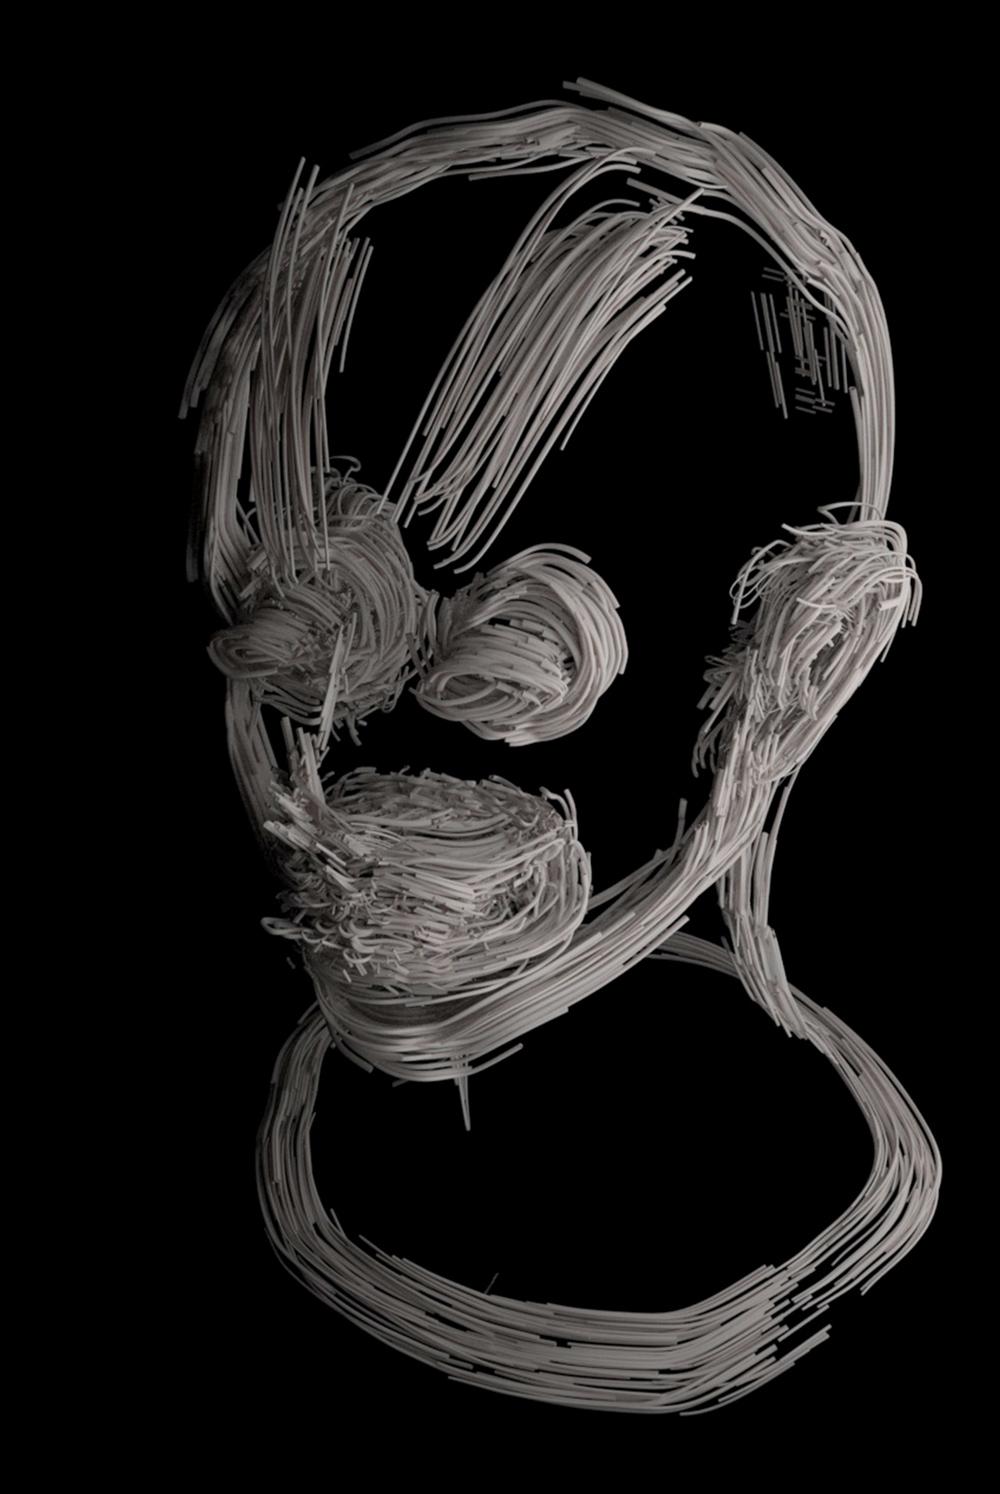 Spaghetti_Man_three_Scection_01